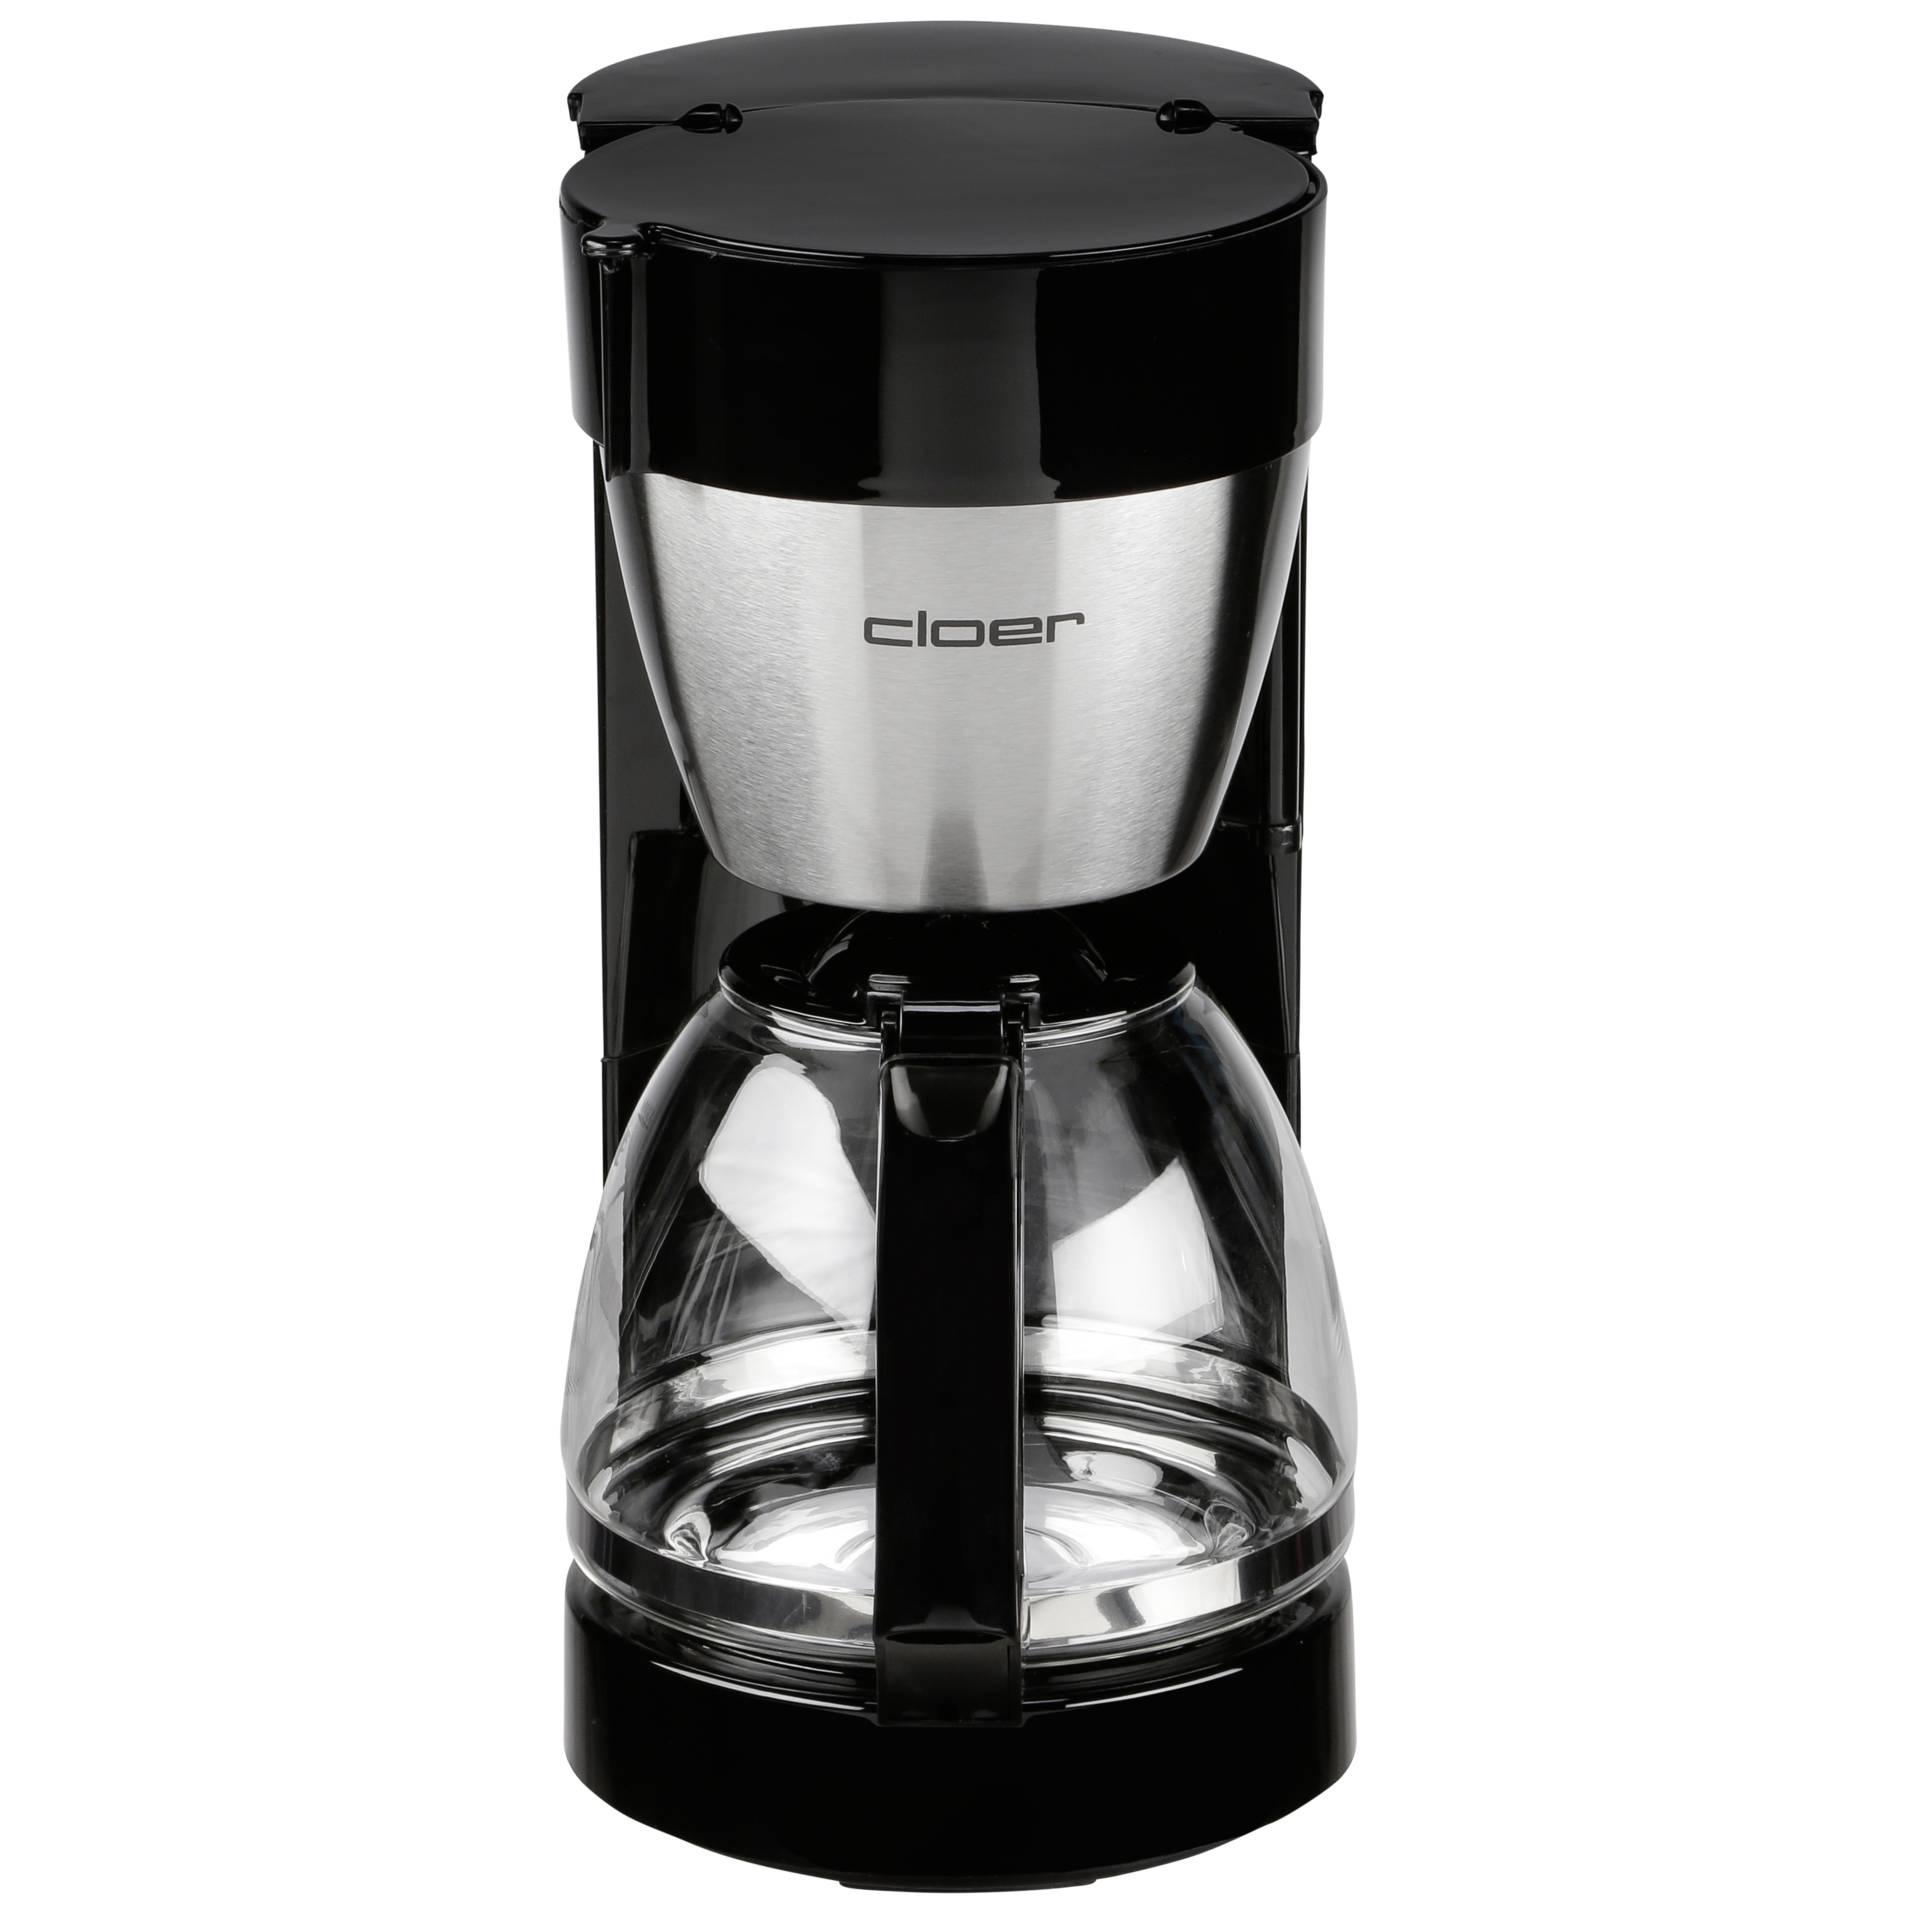 Cloer 5019 Kaffeemaschine